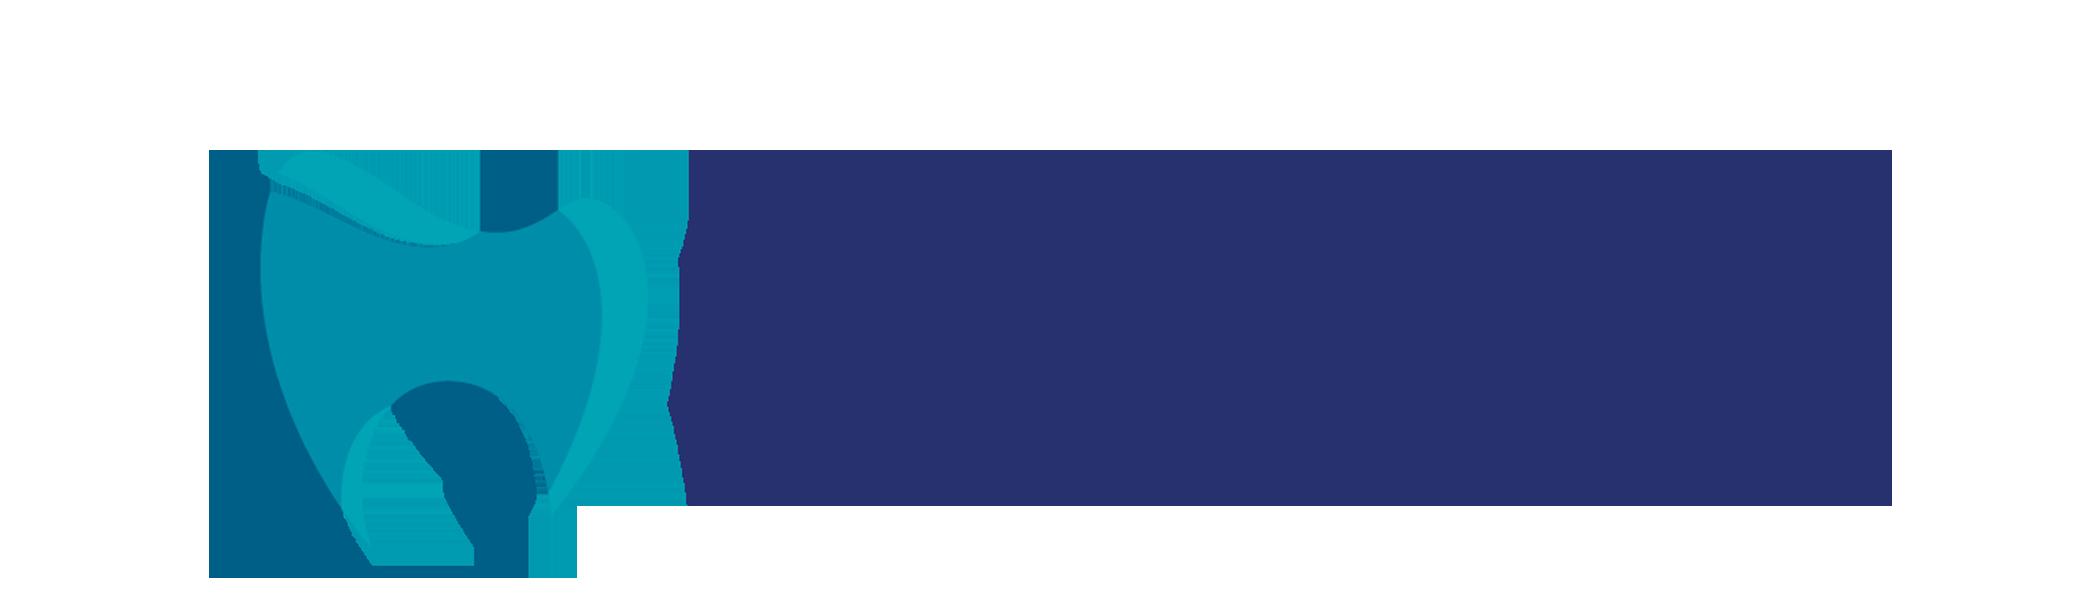 Dentric